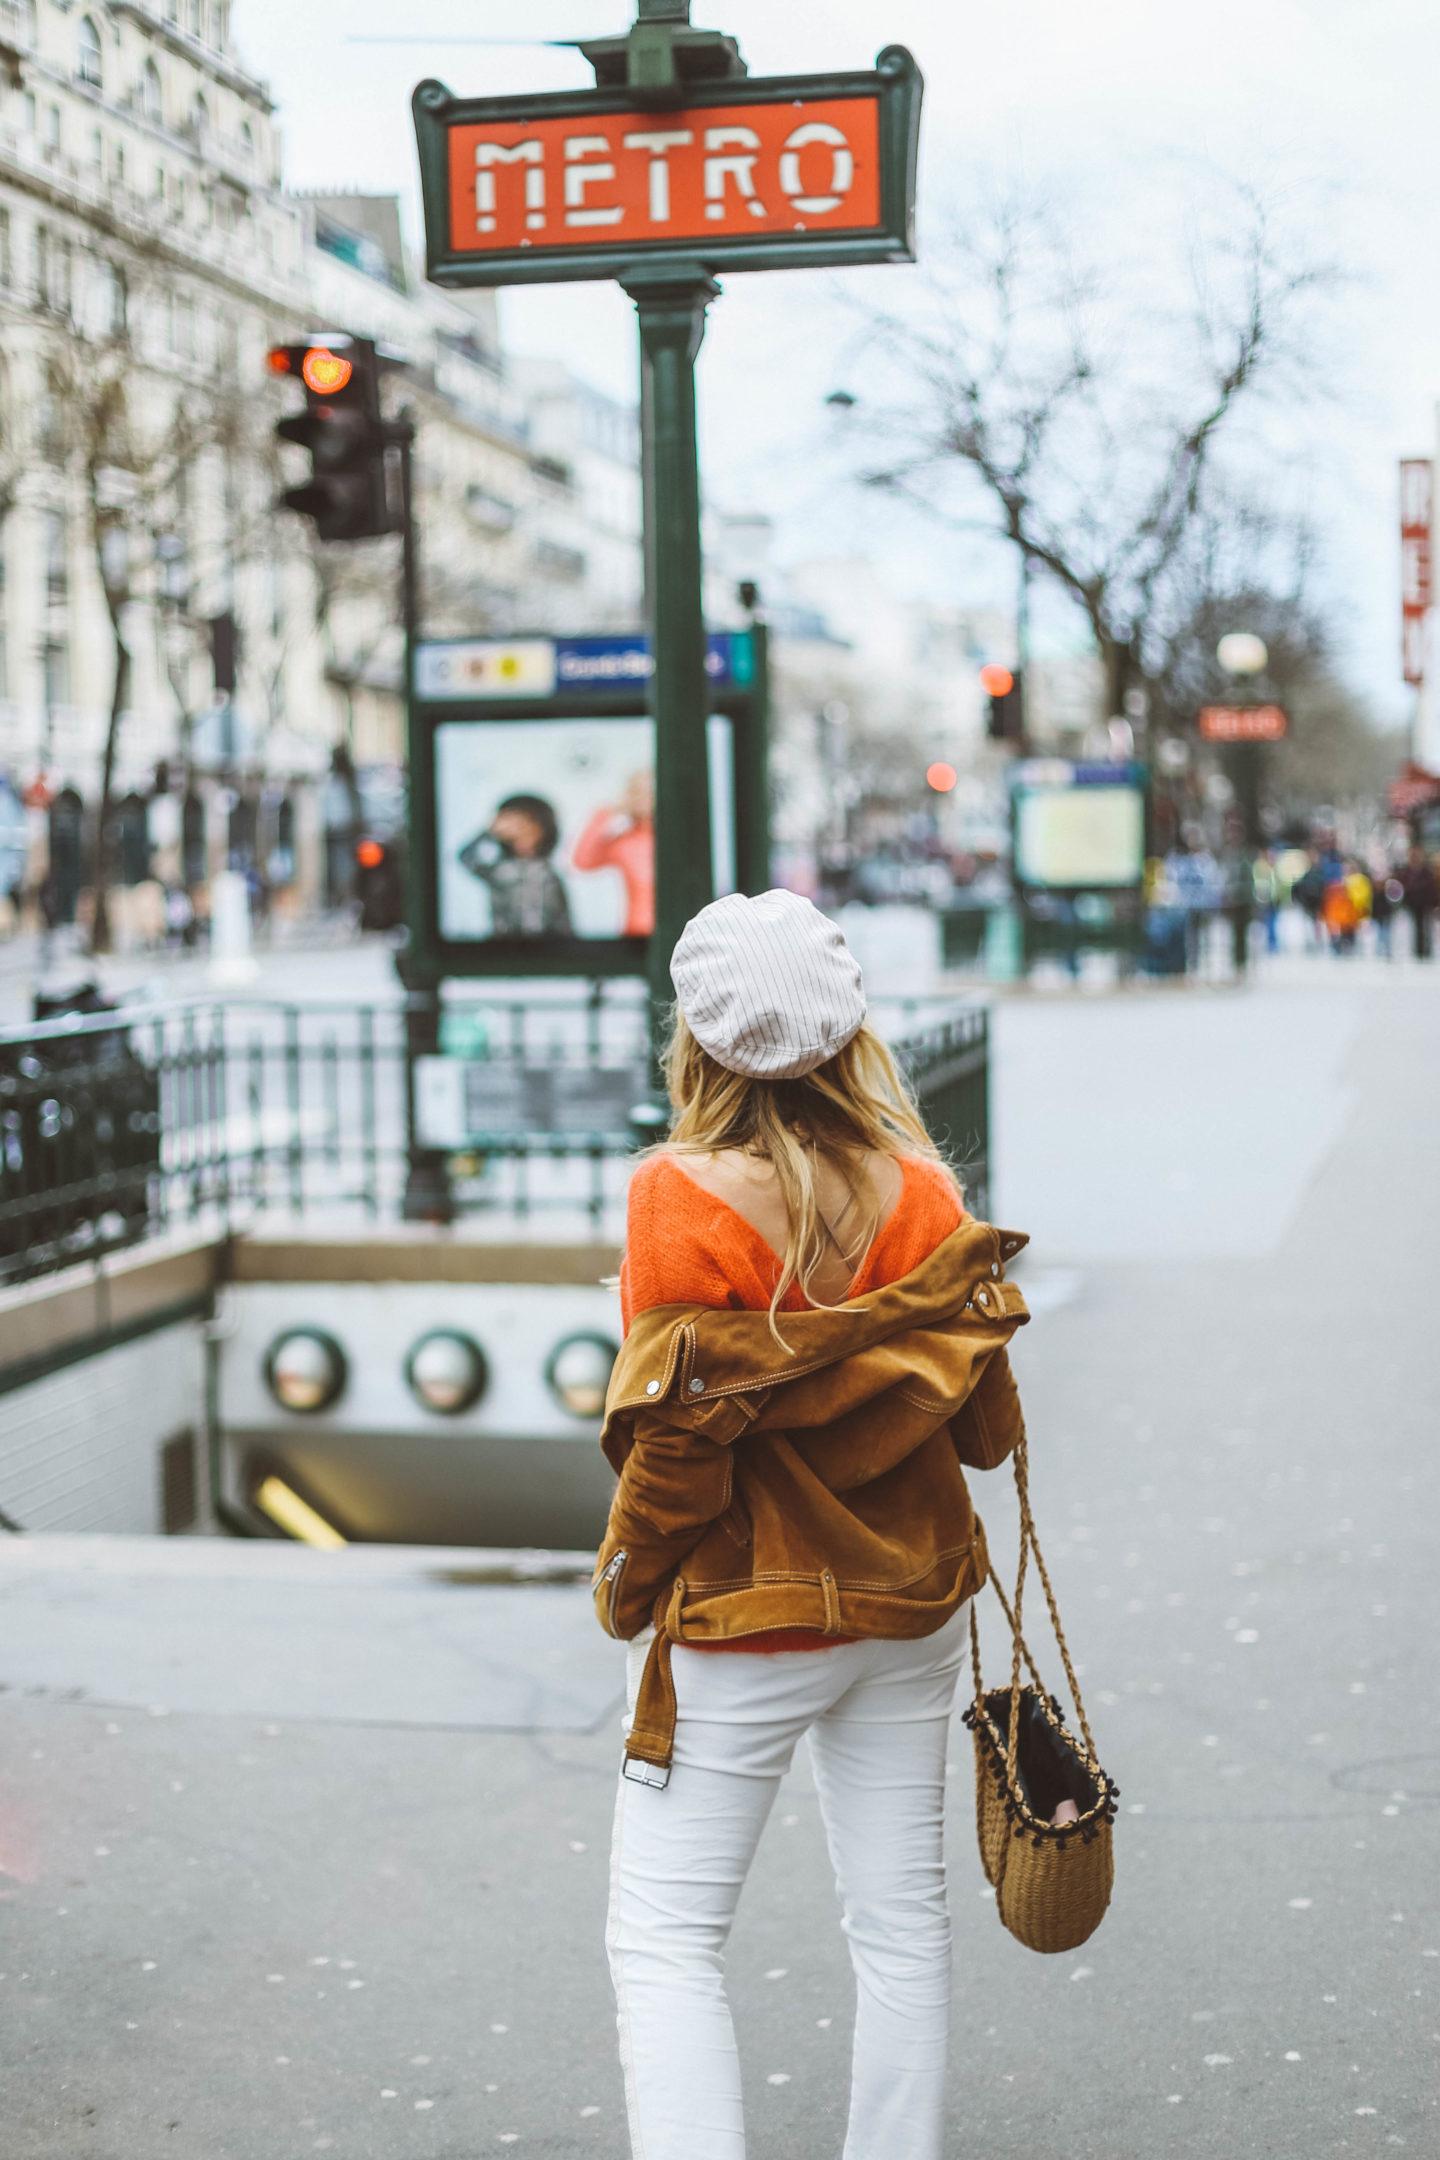 Panier Osier MKT Studio - Blondie Baby blog mode et voyages